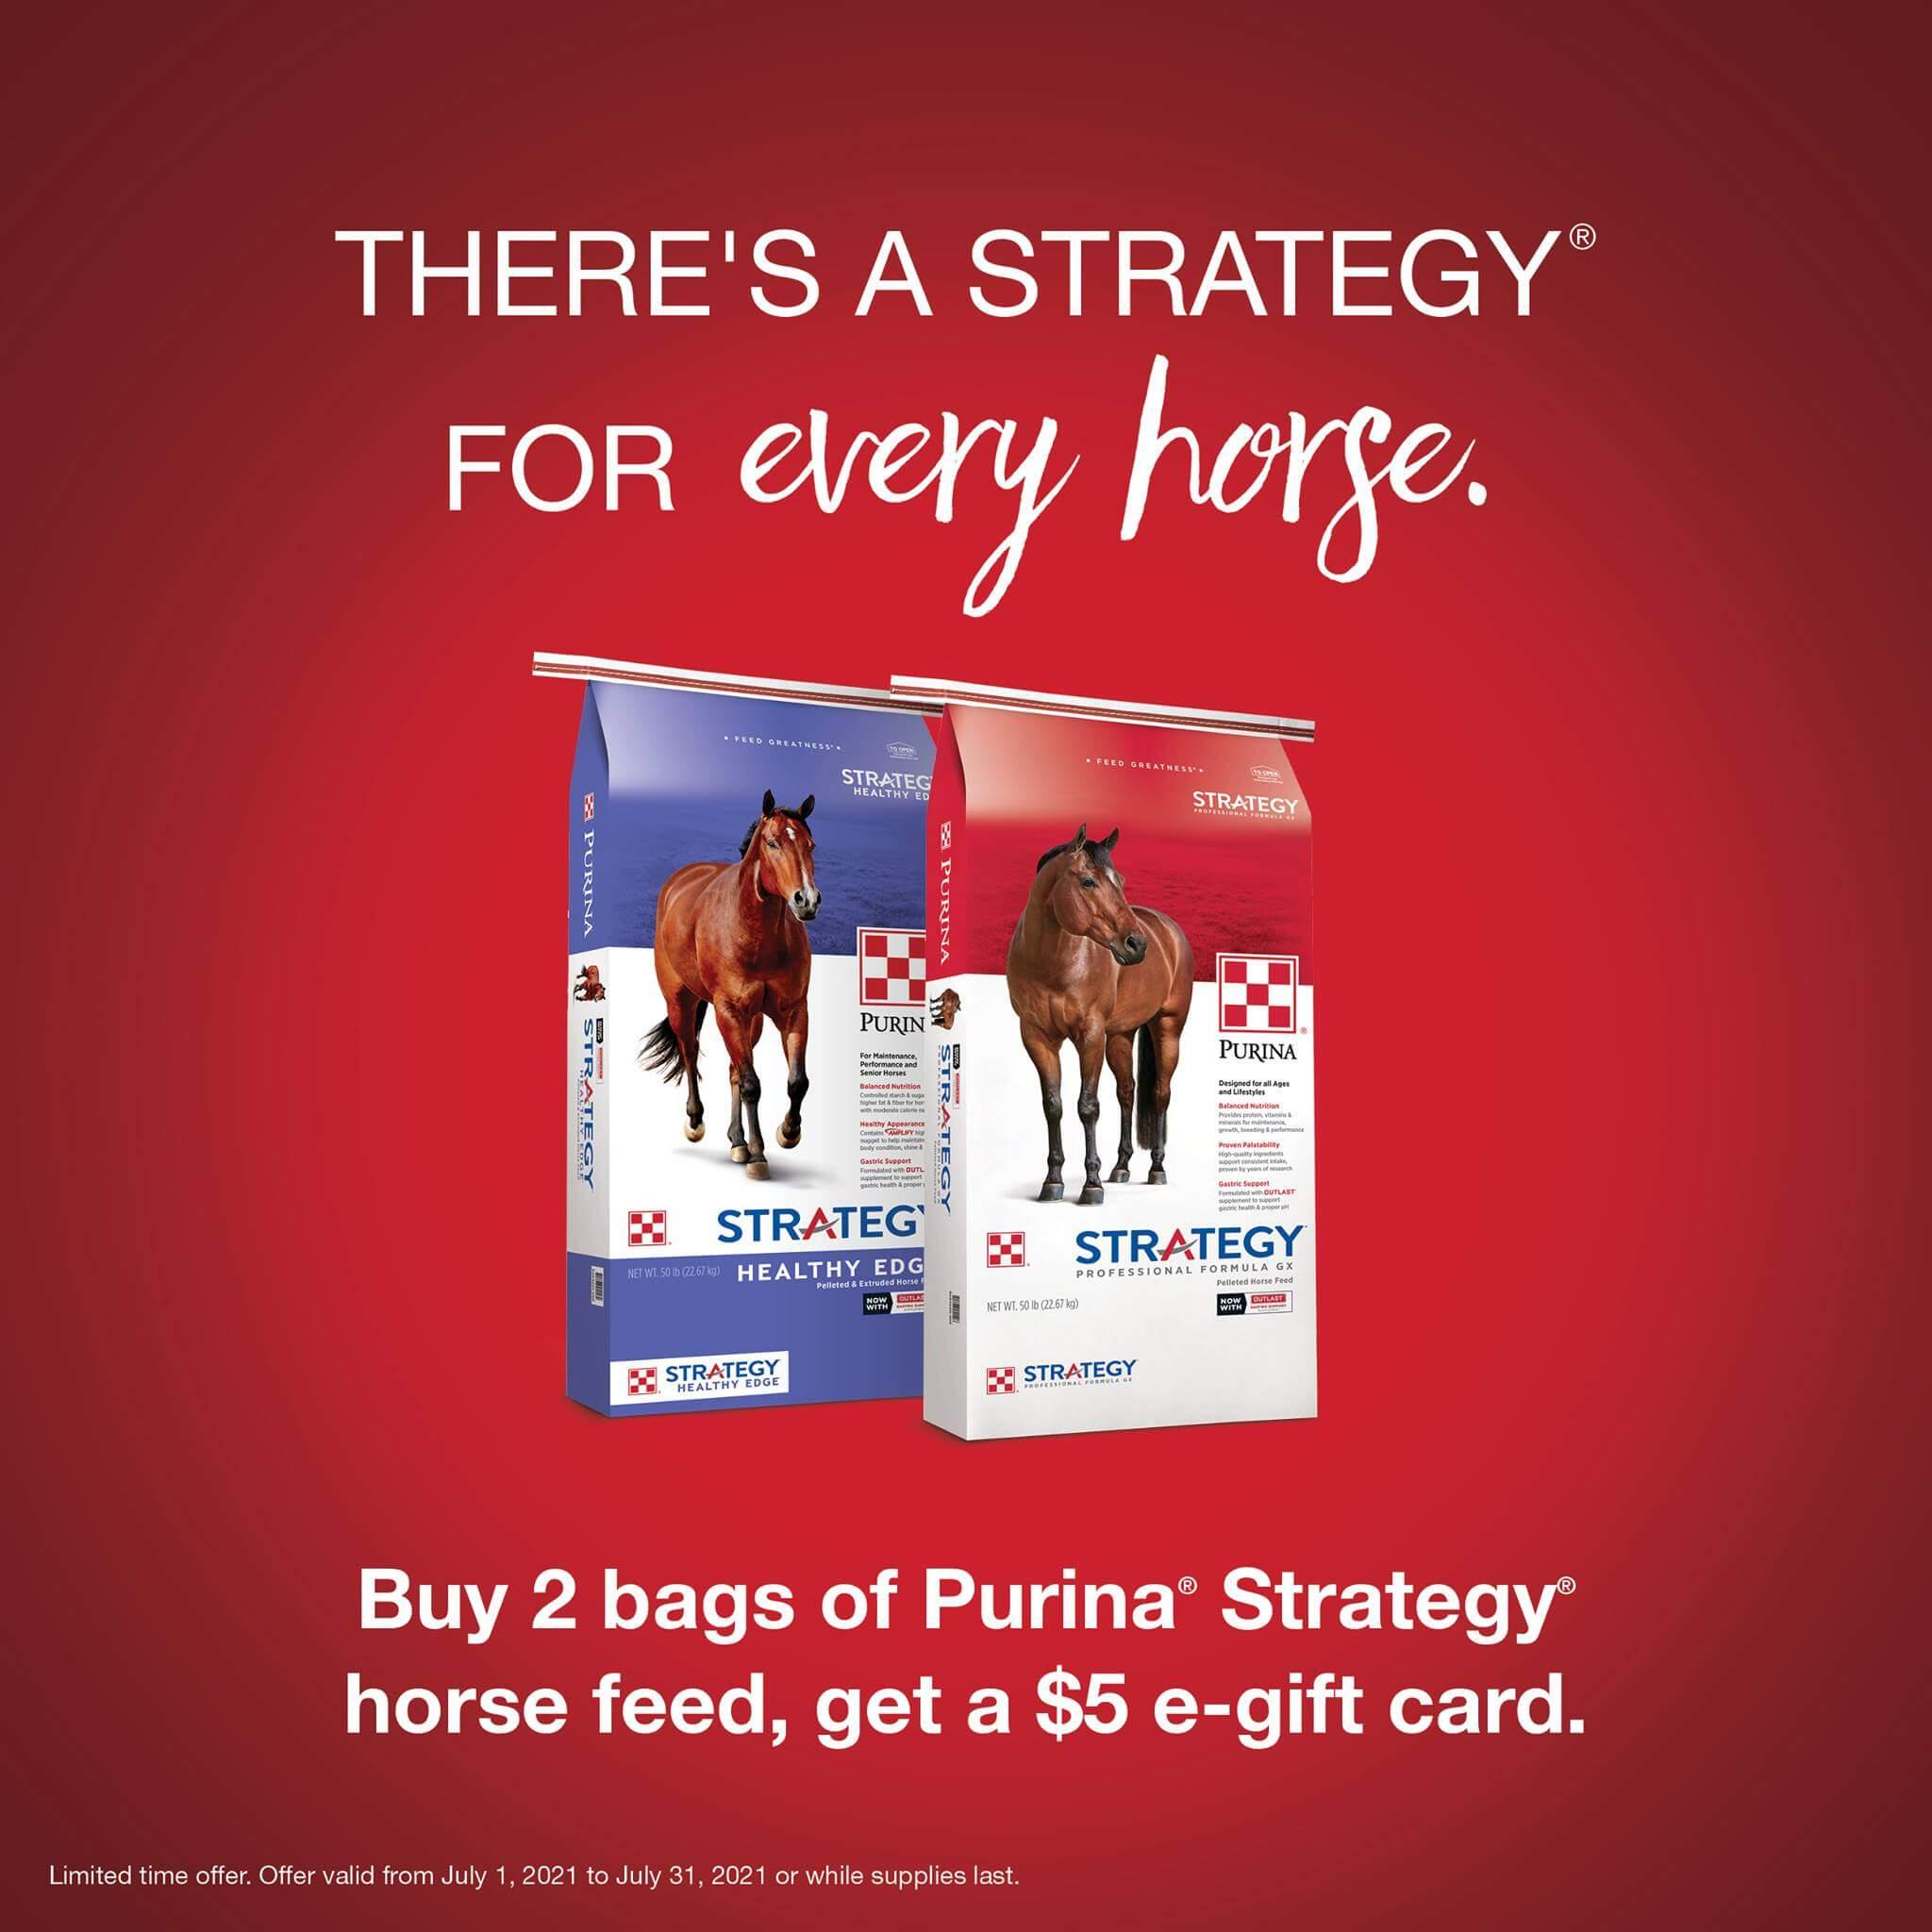 strategy healthy edge july promo purina horse feed